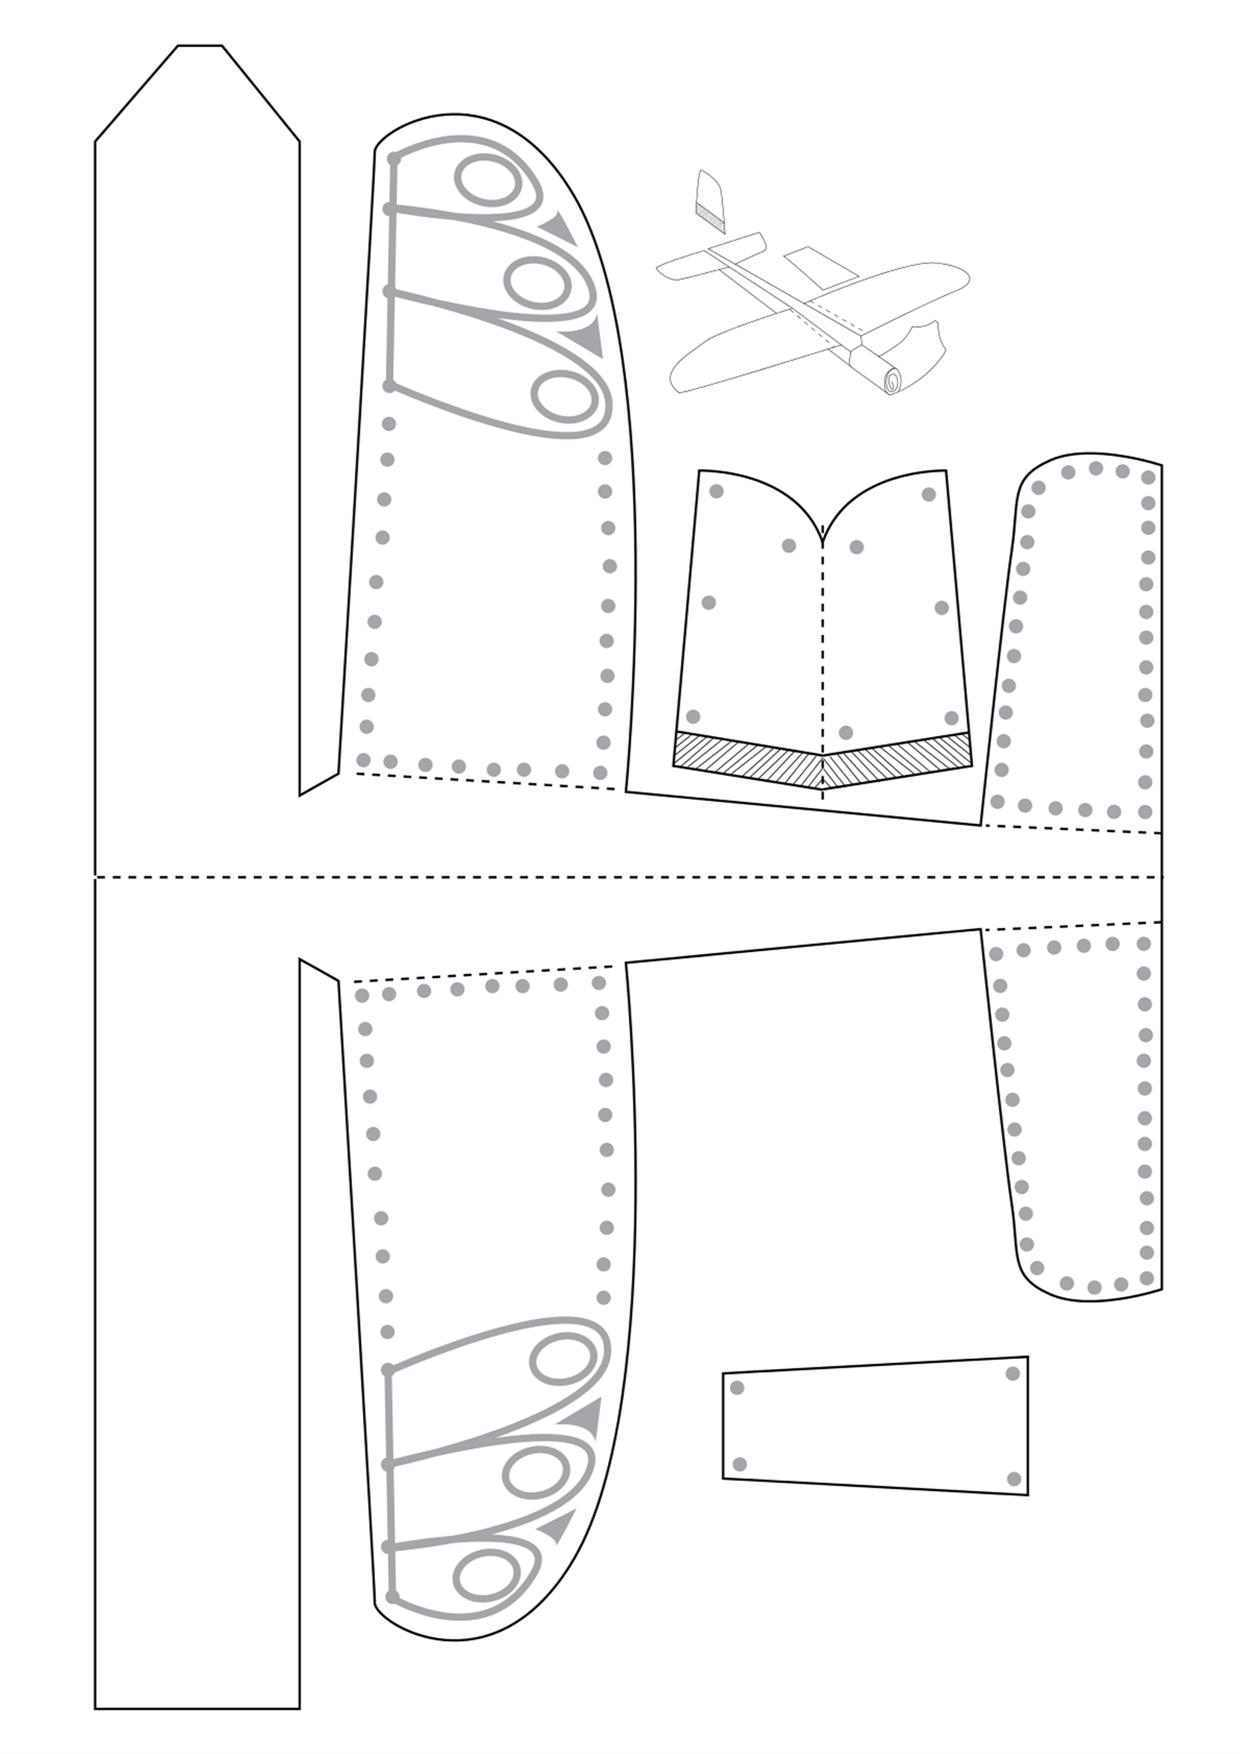 الگوی هواپیما